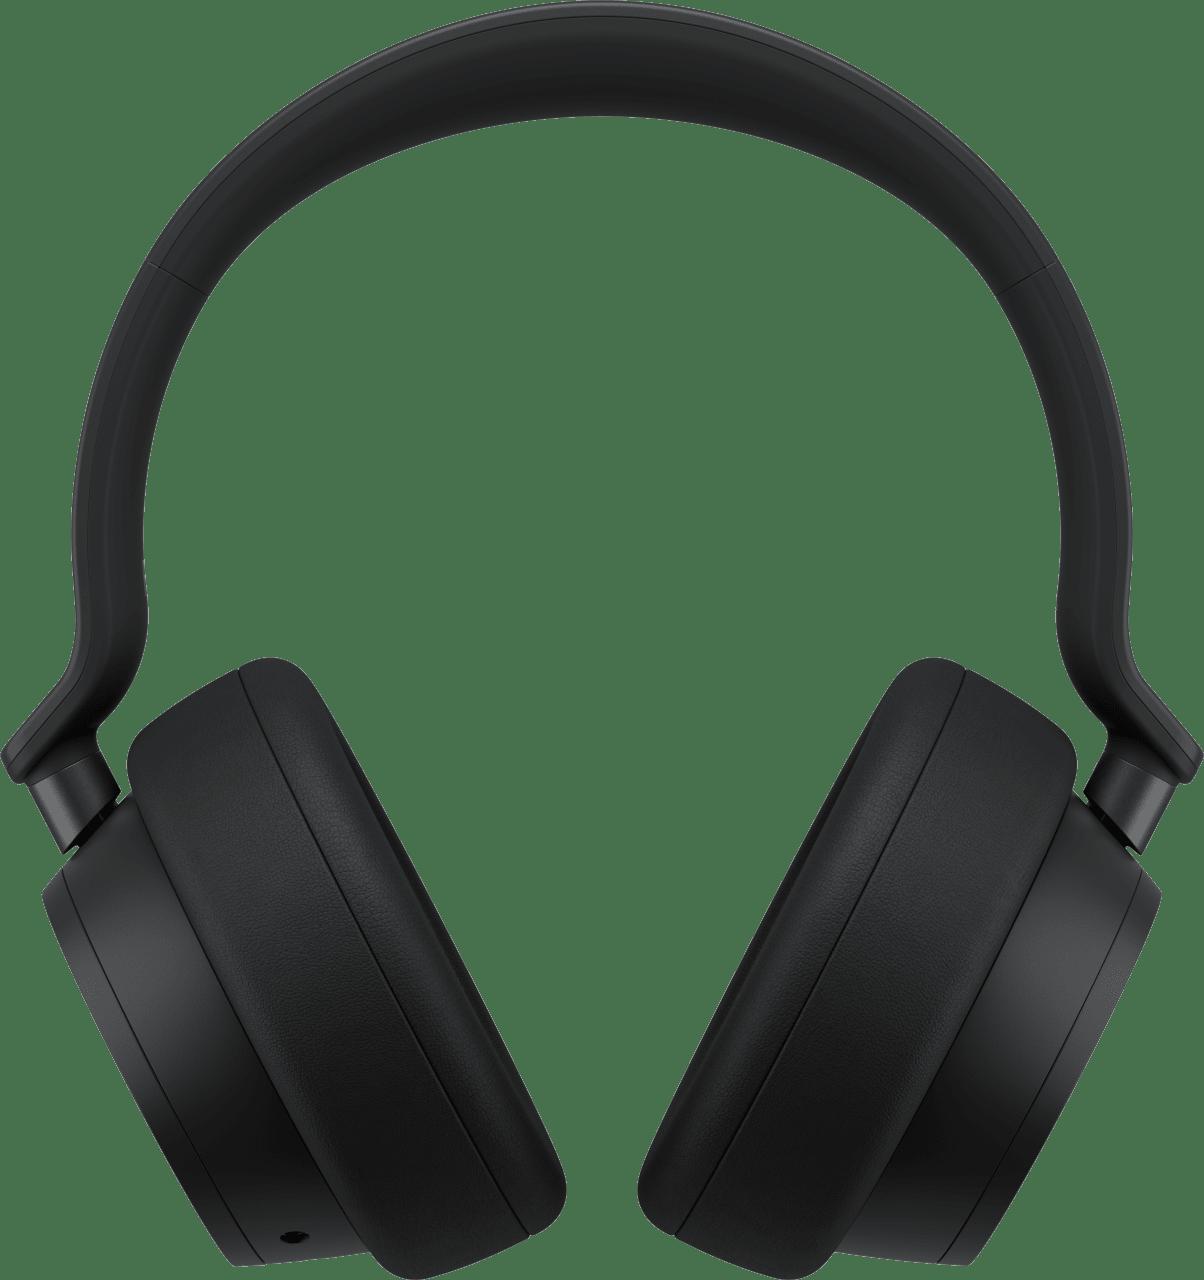 Black Microsoft Surface 2 Over-ear Bluetooth Headphones.2